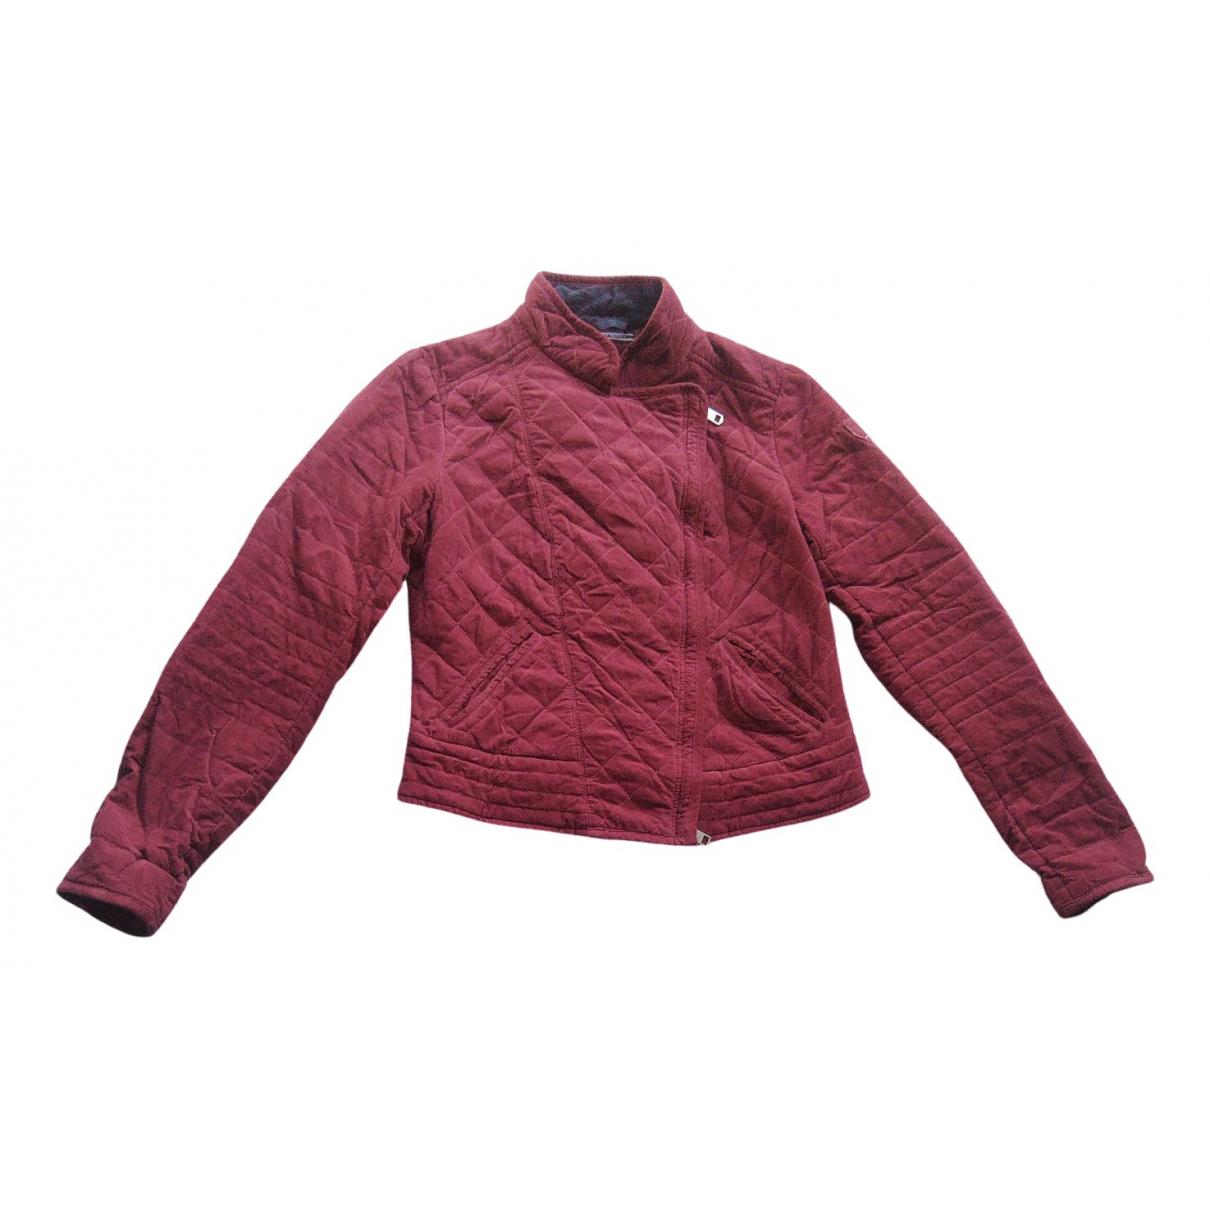 Tommy Hilfiger \N Burgundy jacket for Women S International